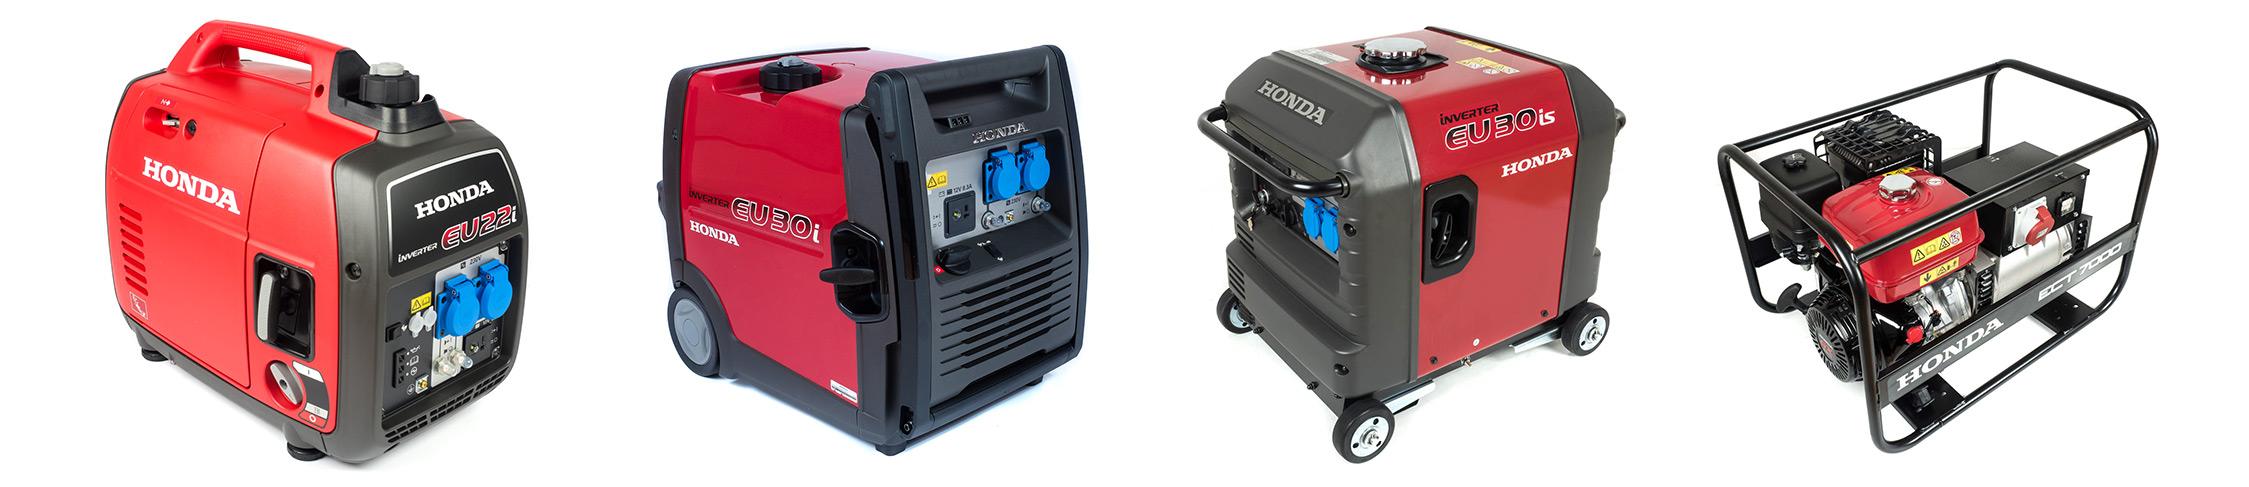 Stromerzeuger FAQ